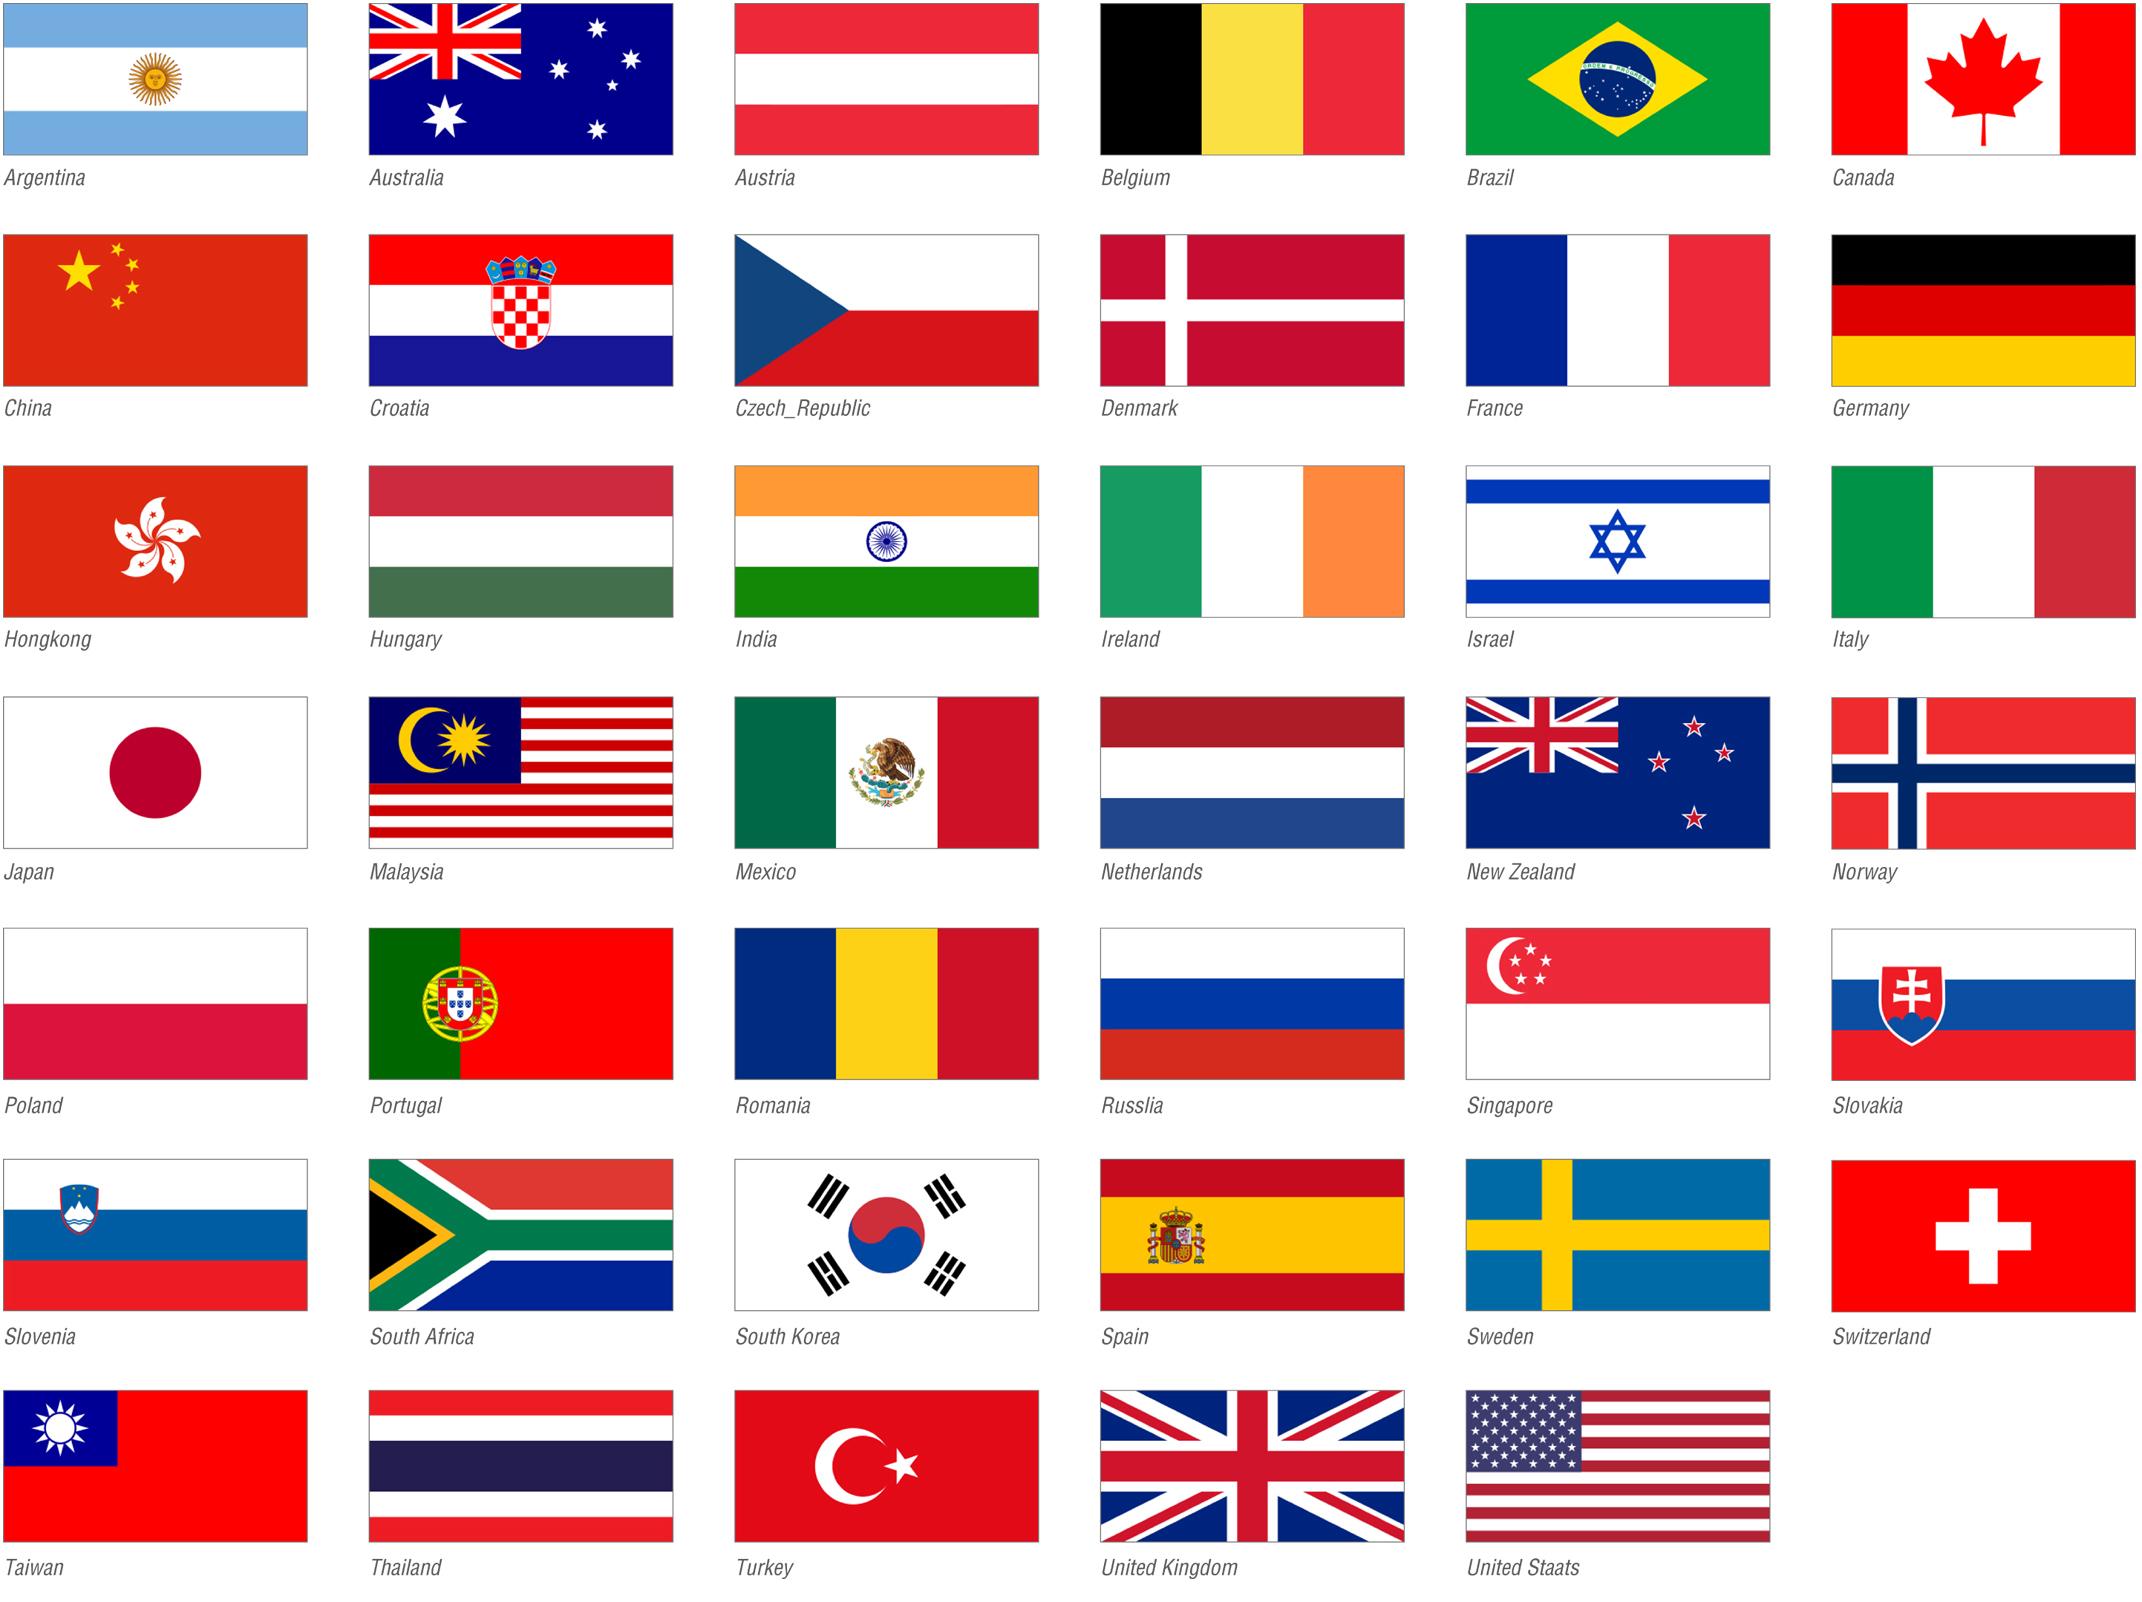 NeuroCheck - Worldwide used solutions (Image © NeuroCheck)